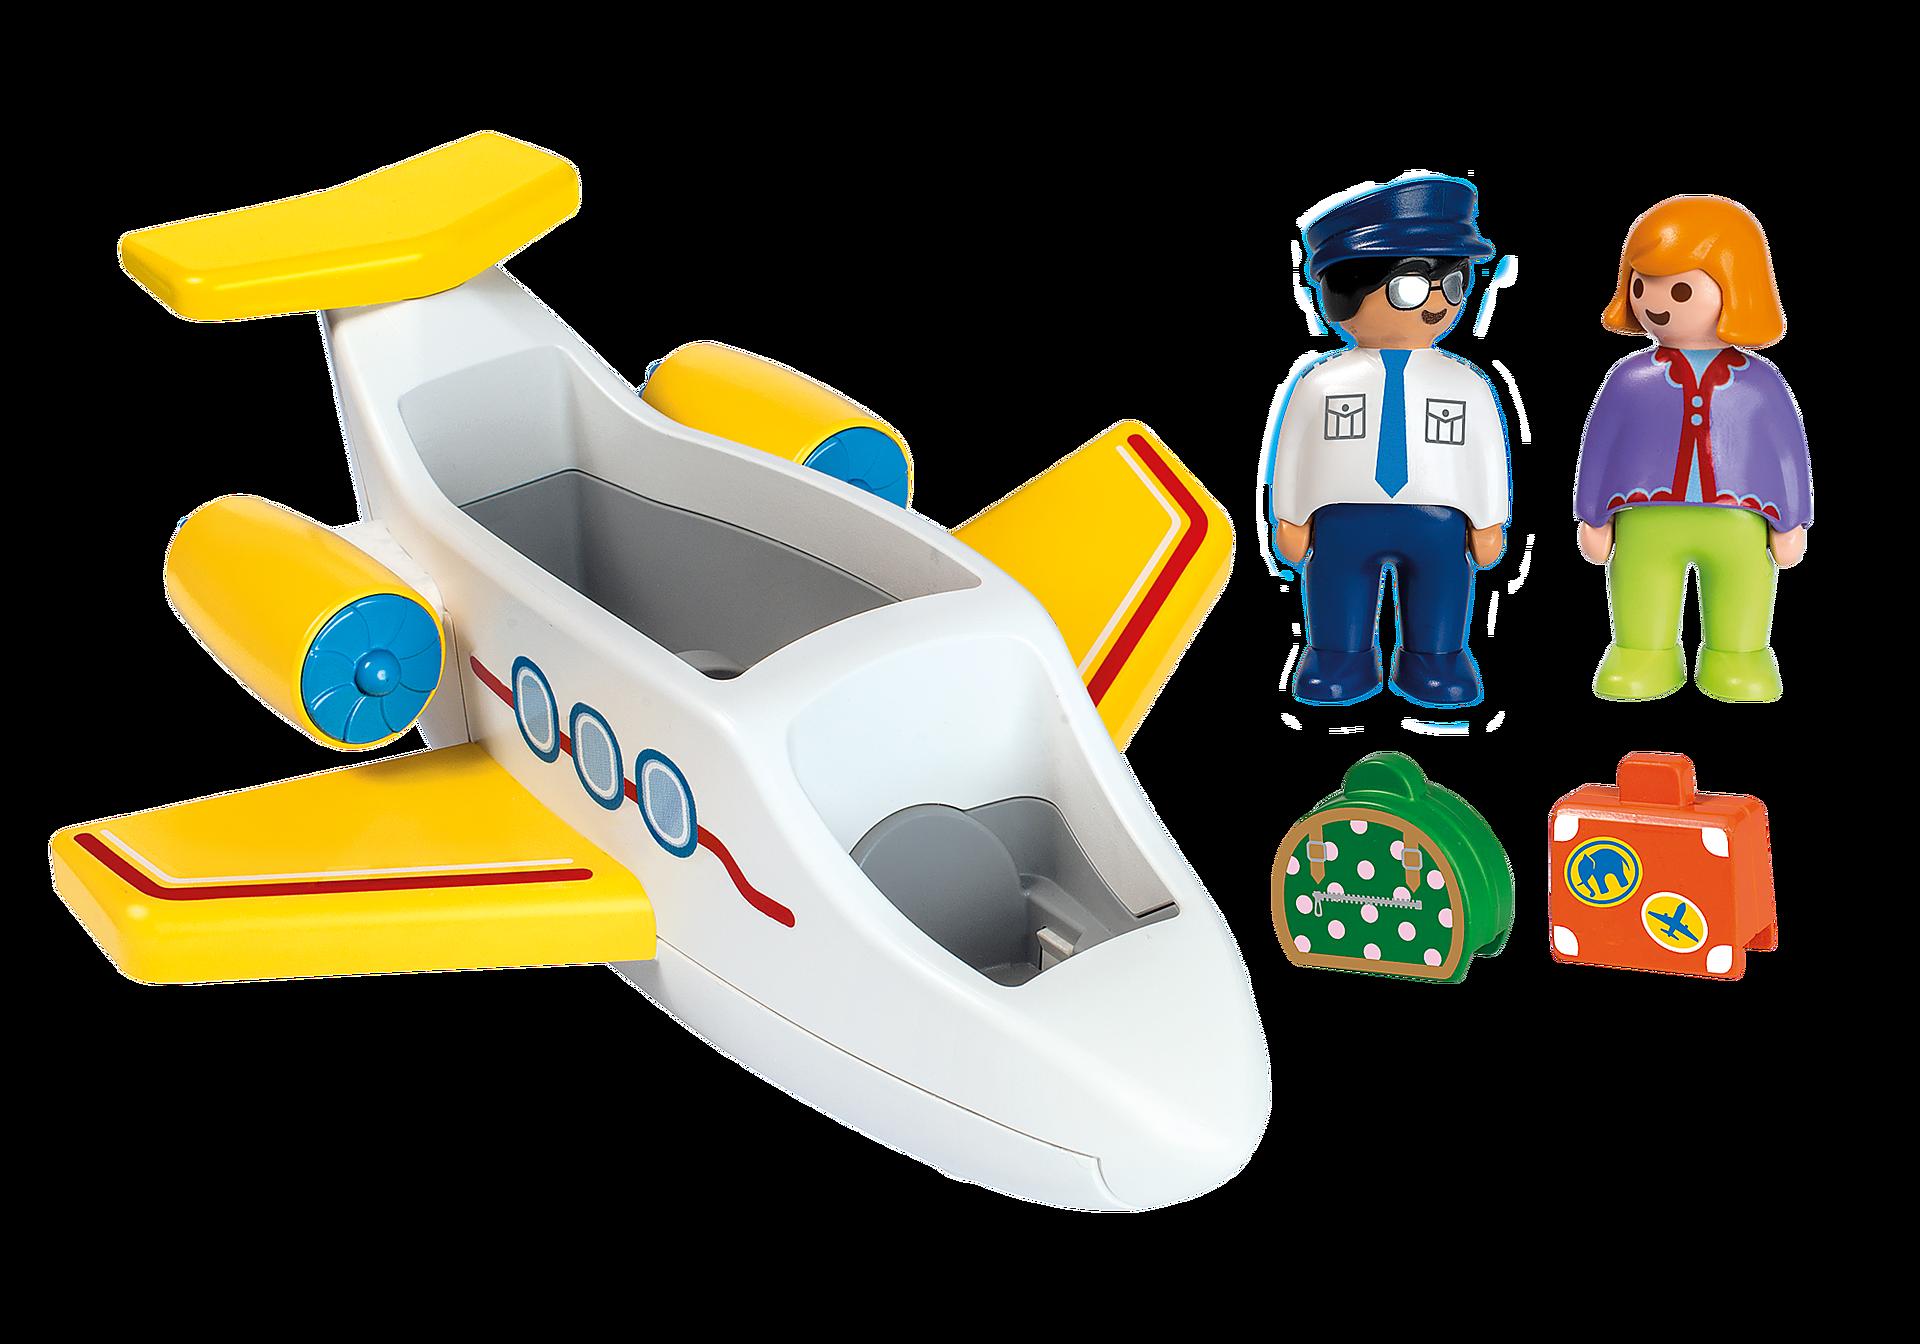 70185 Plane with Passenger zoom image3